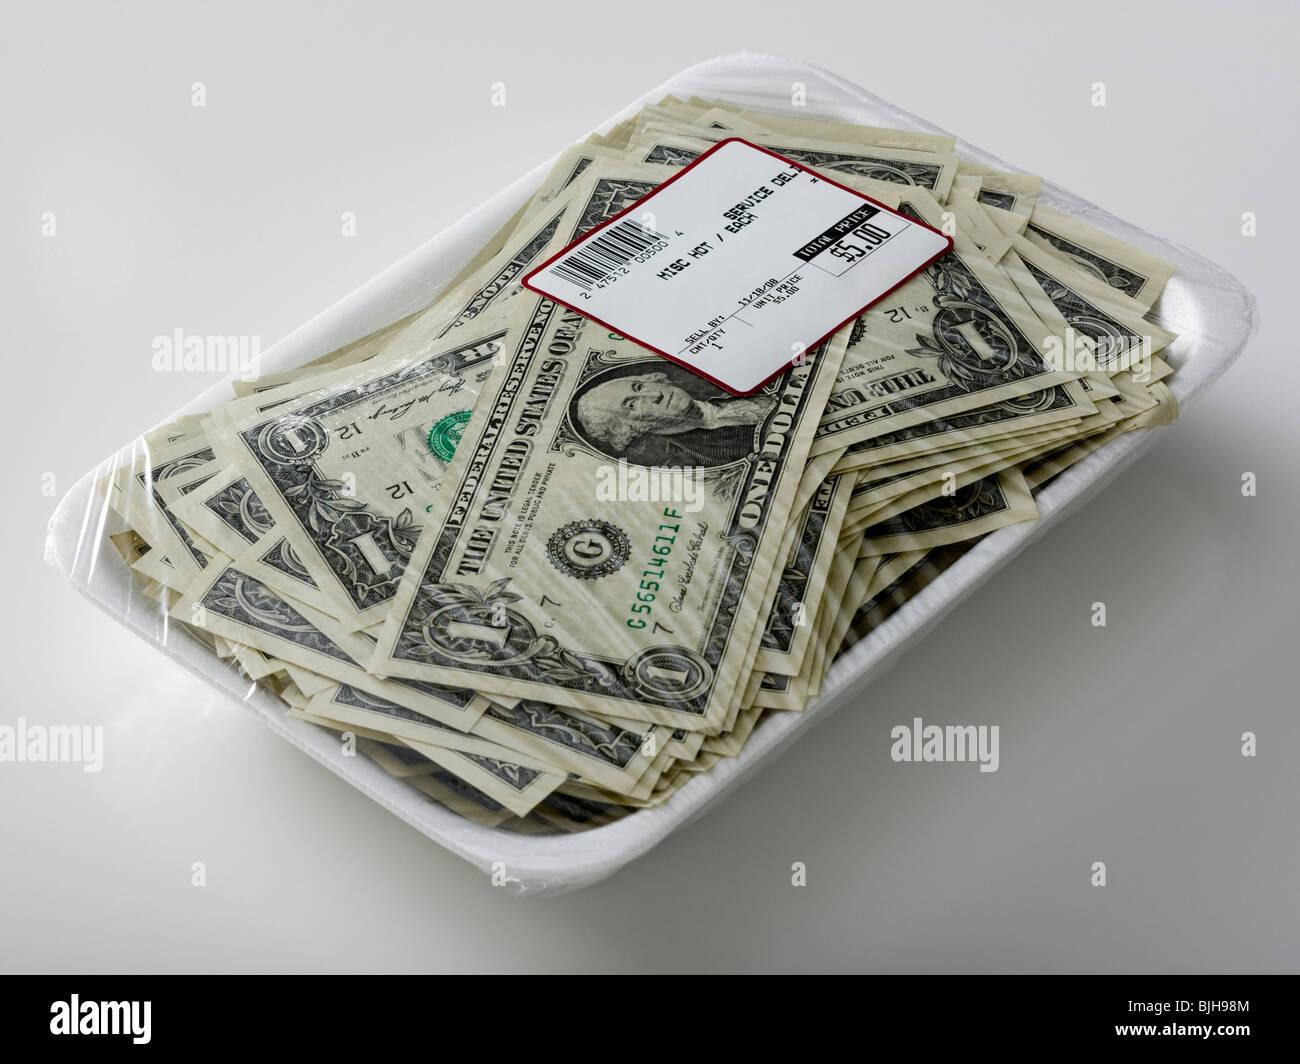 us dollars in a supermarket shrinkwrap package - Stock Image